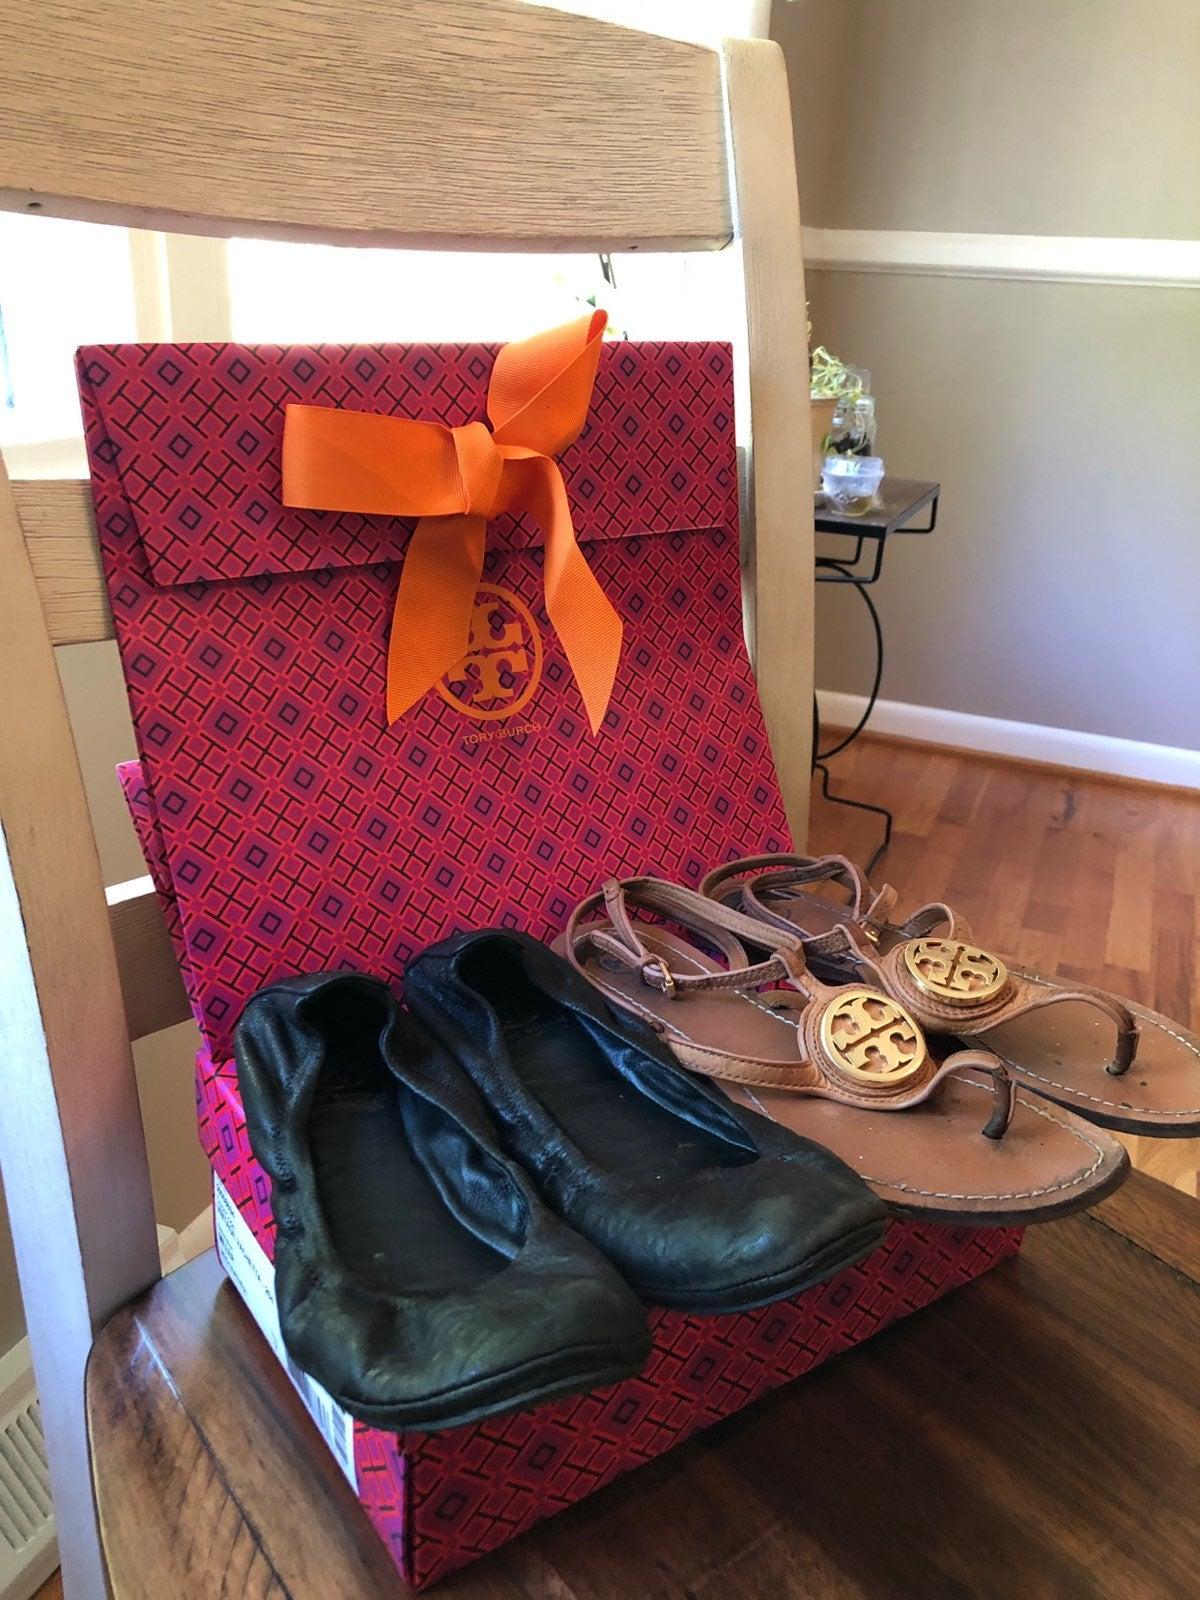 Tory Burch Shoes 2 pair